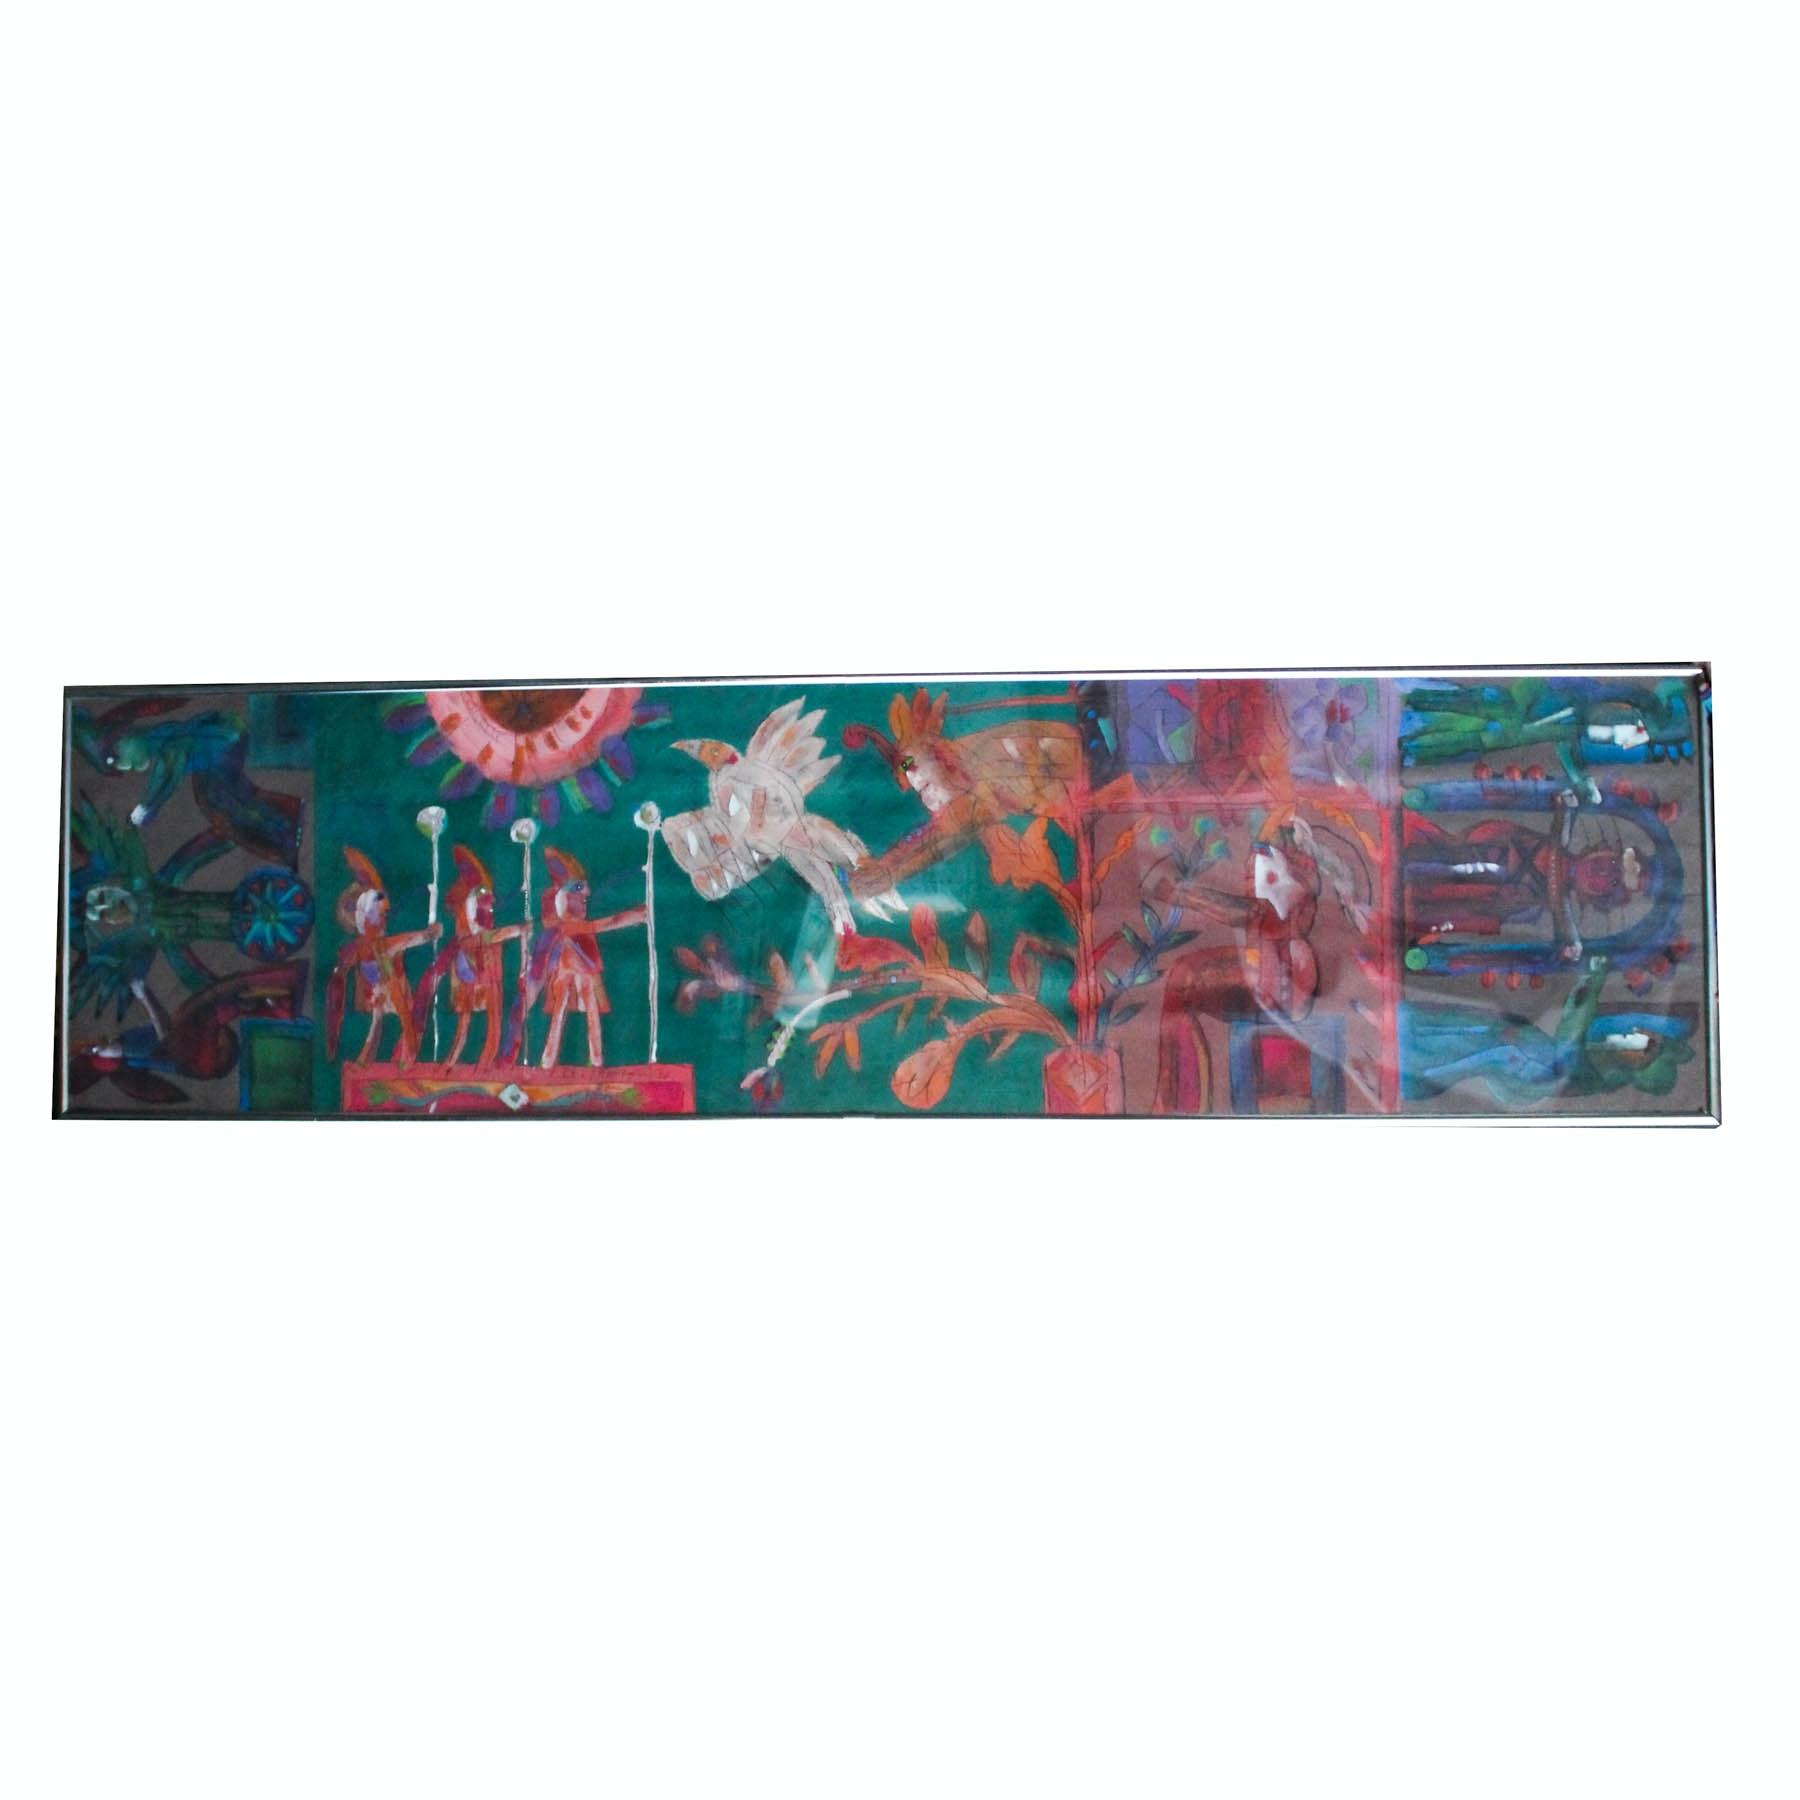 Norman Laliberte Very Large Original Acrylic Painting